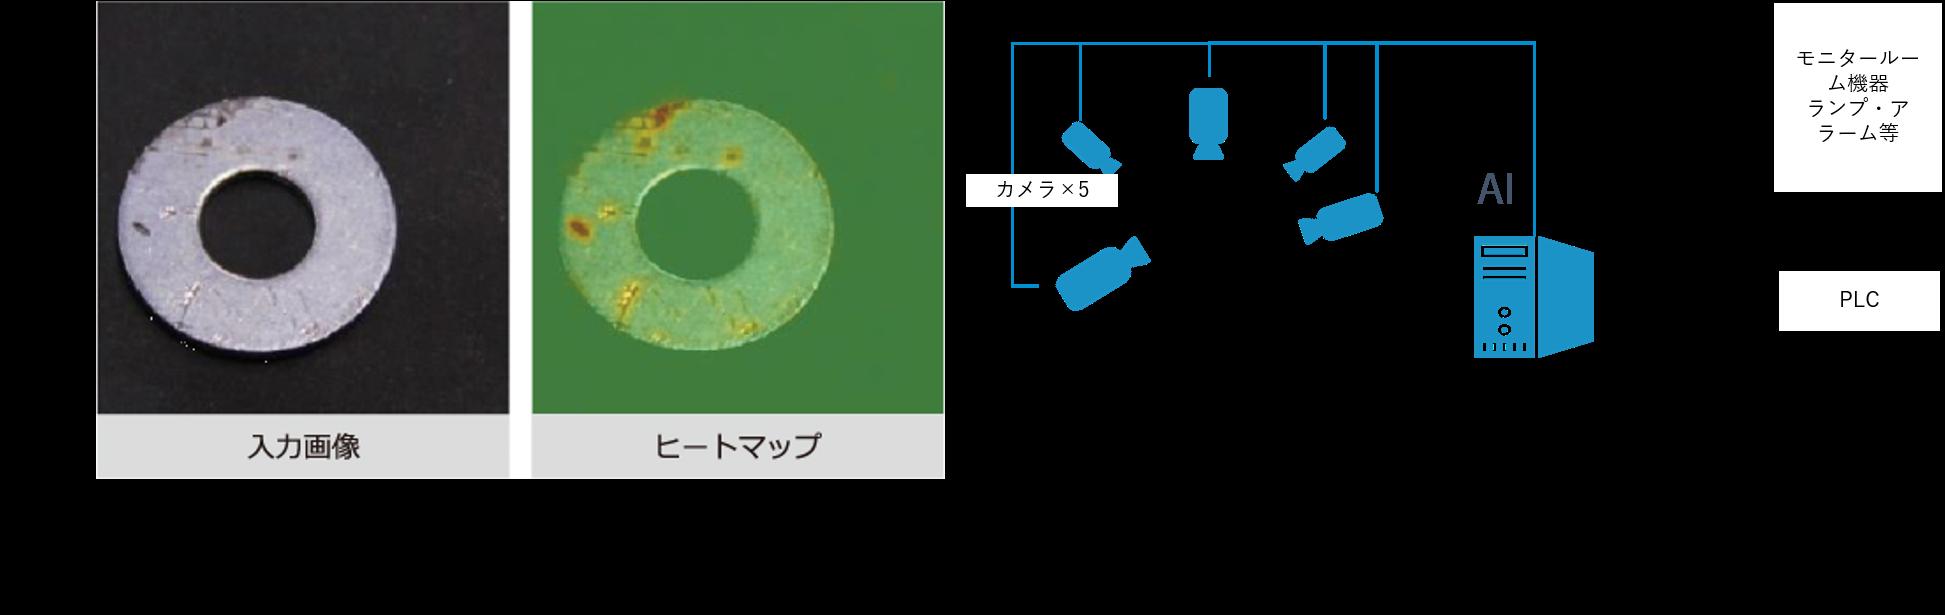 AIによる検品イメージ